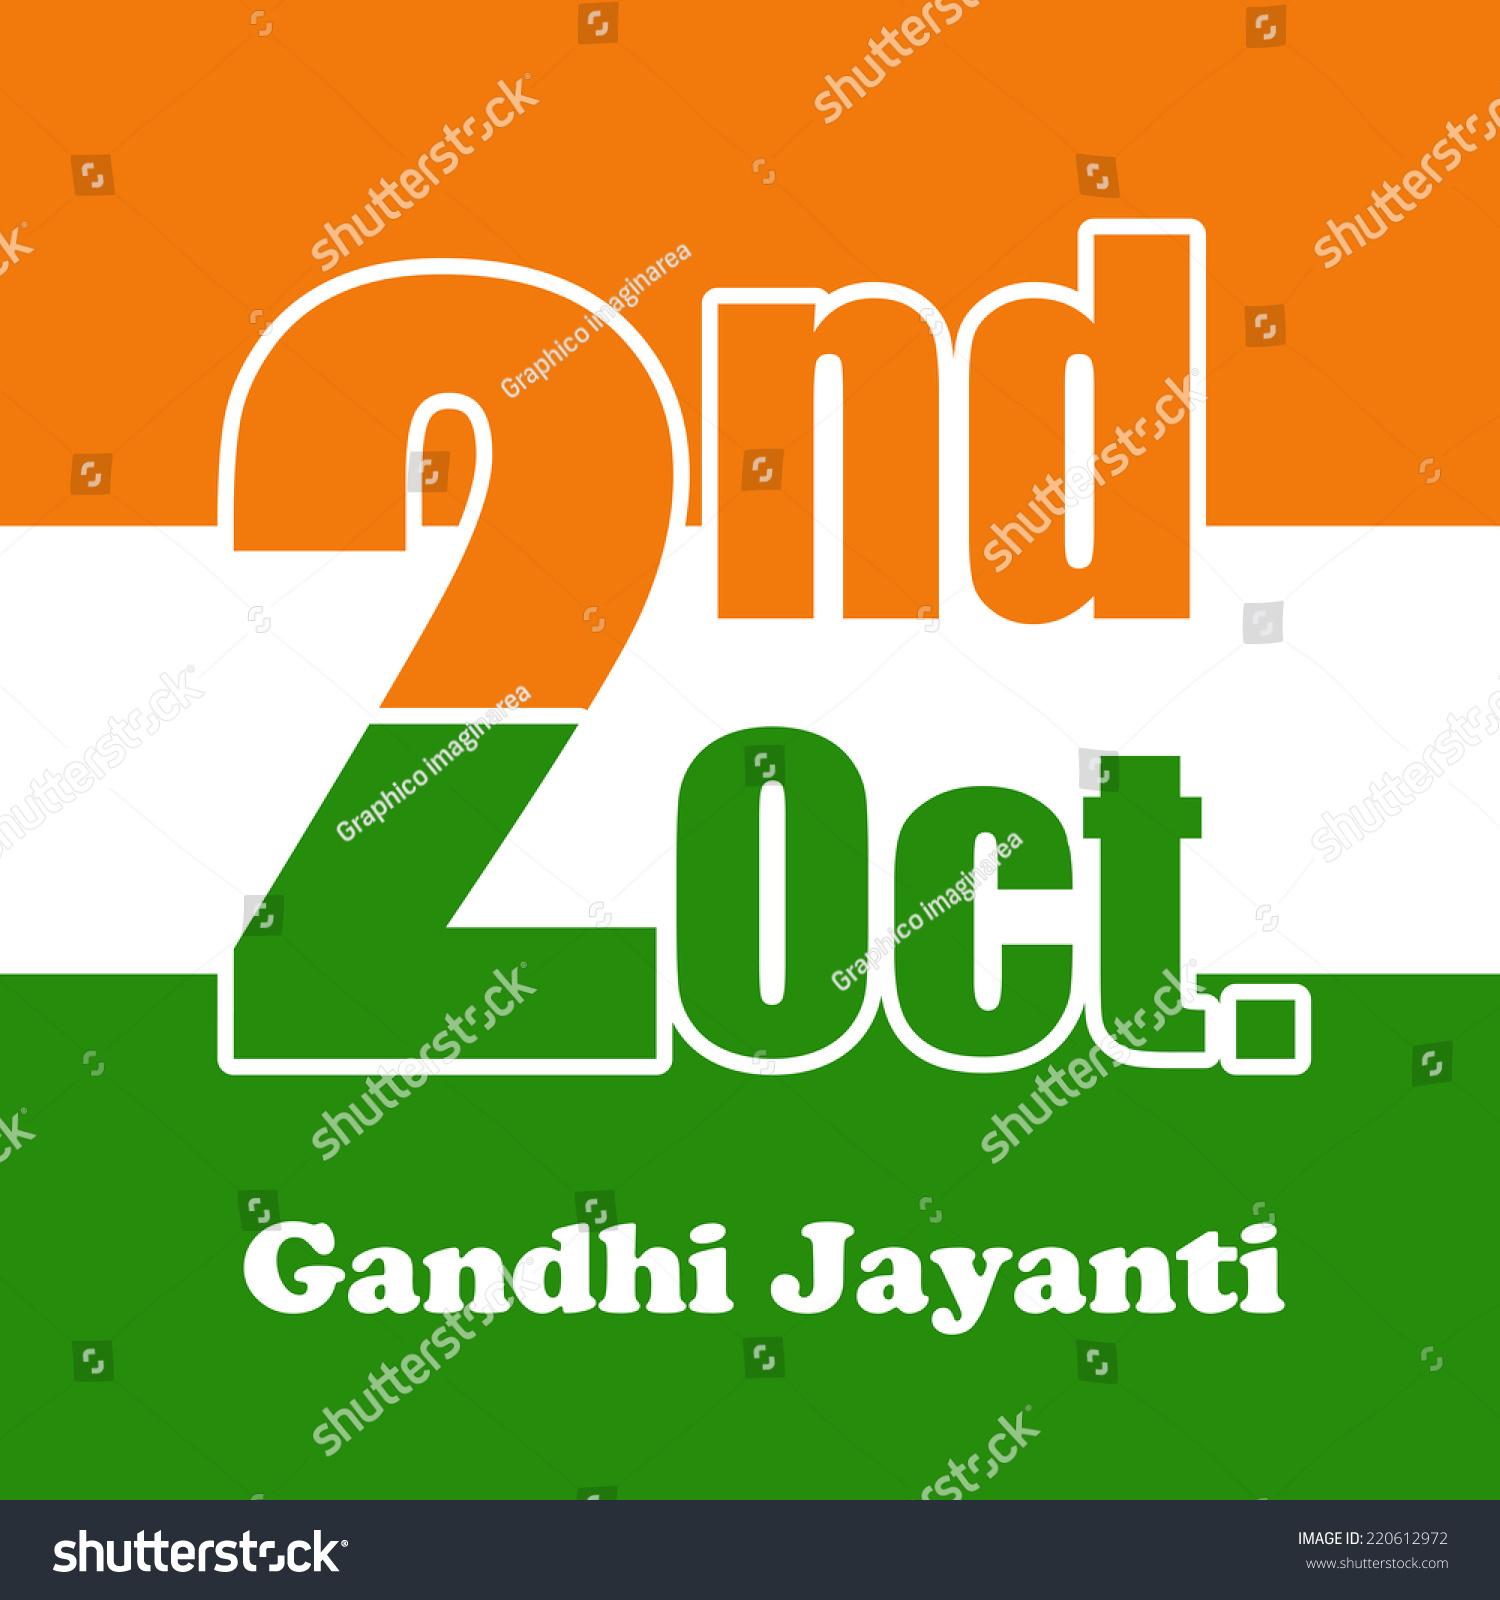 gandhi birthday Illustration Gandhi Jayanti Celebrated By Indians Stock Vector  gandhi birthday